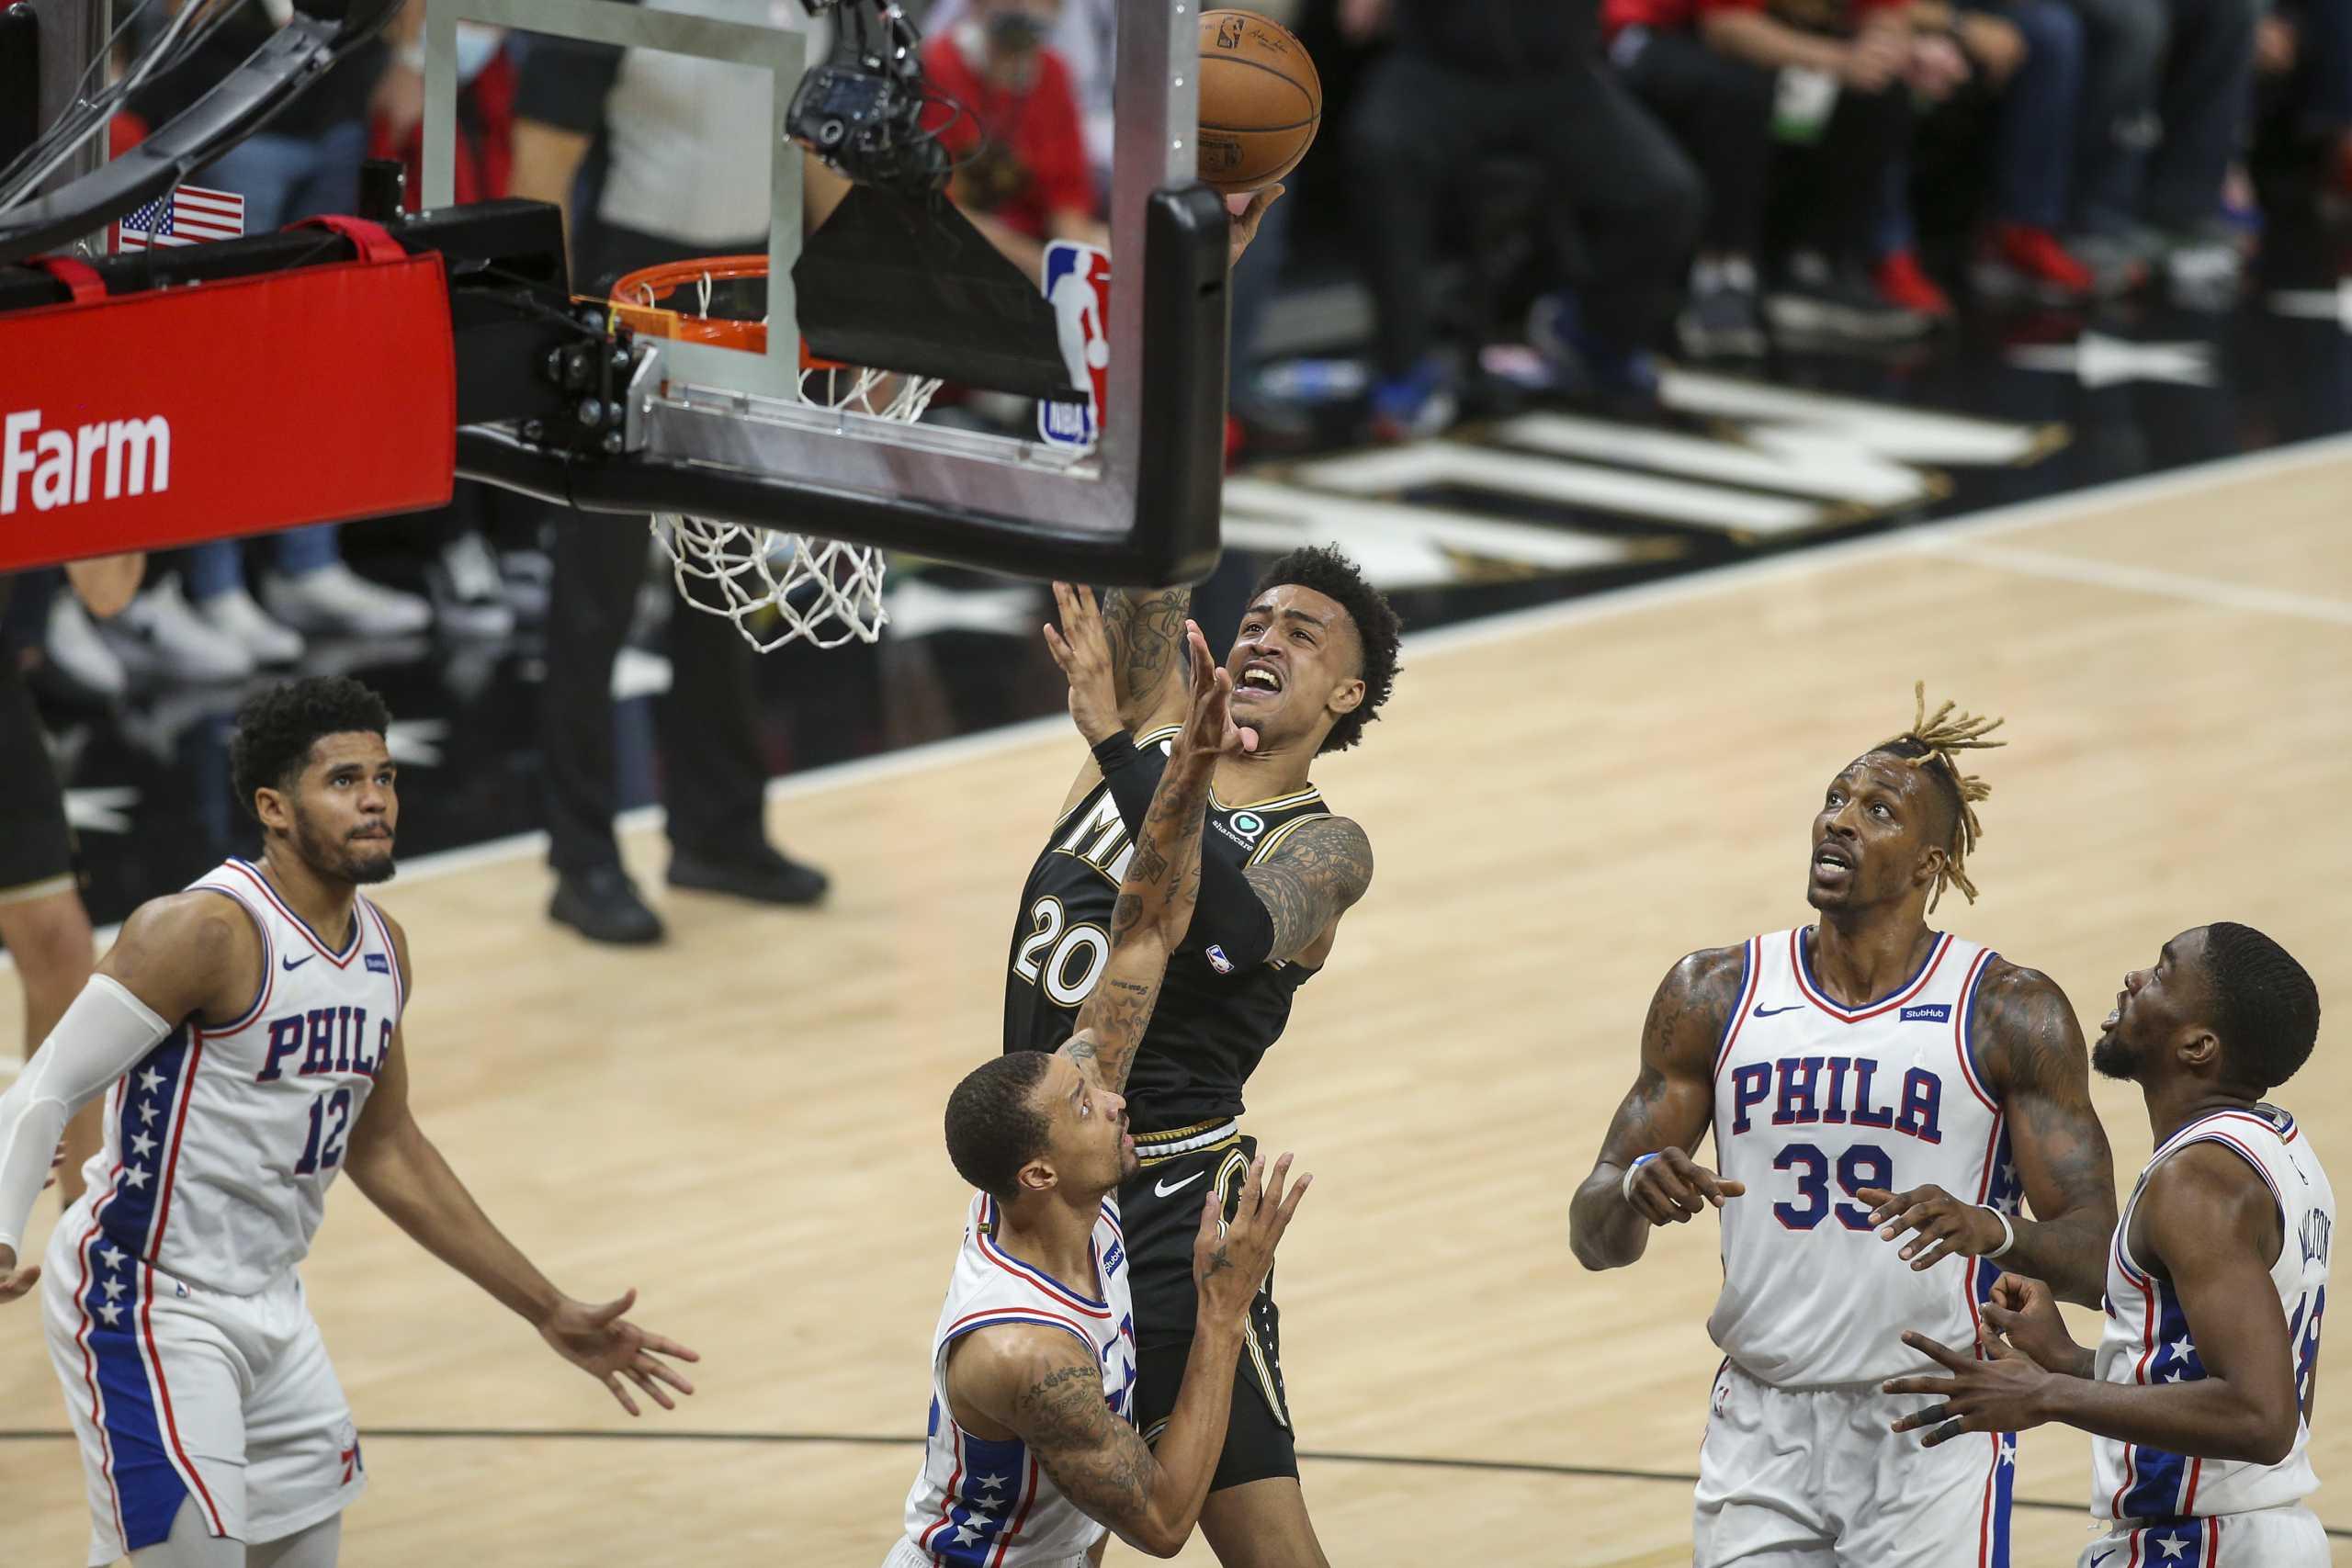 NBA: «Ψυχωμένοι» Χοκς και καταιγιστικοί Κλίπερς ισοφάρισαν σε 2-2 τις σειρές των ημιτελικών